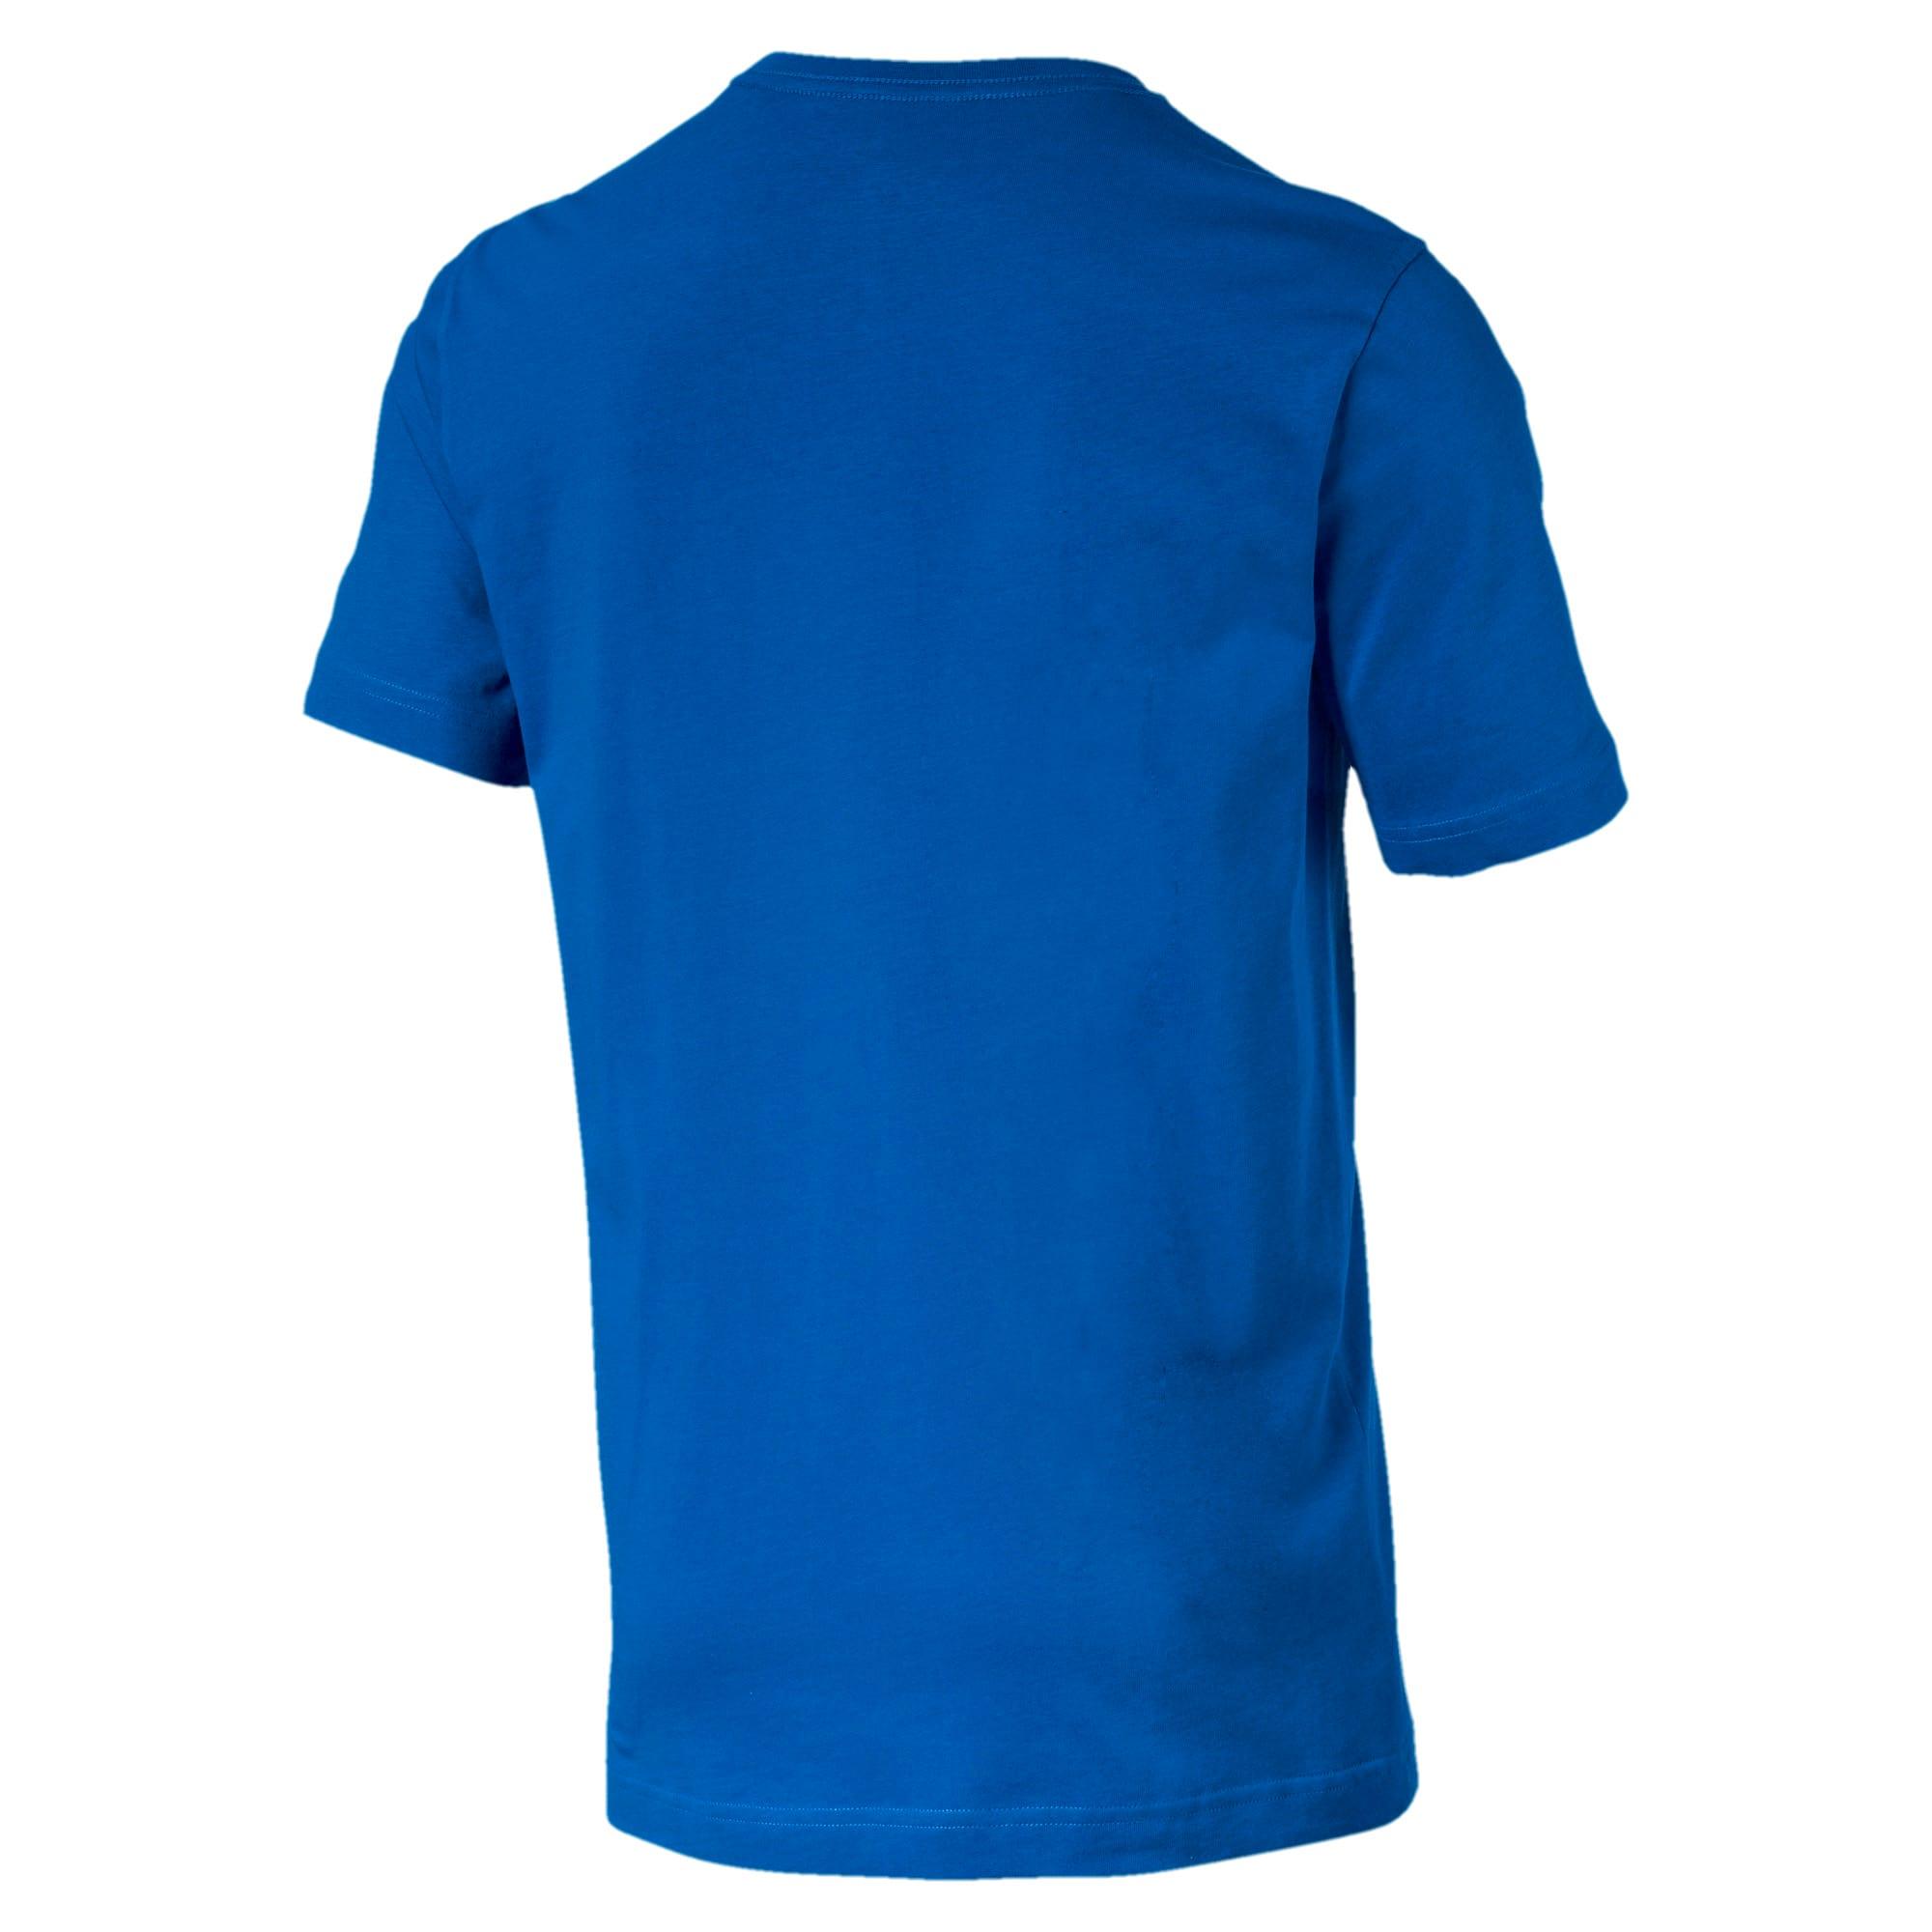 Thumbnail 5 of T-shirt a maniche corte Essentials uomo, Puma Royal, medium